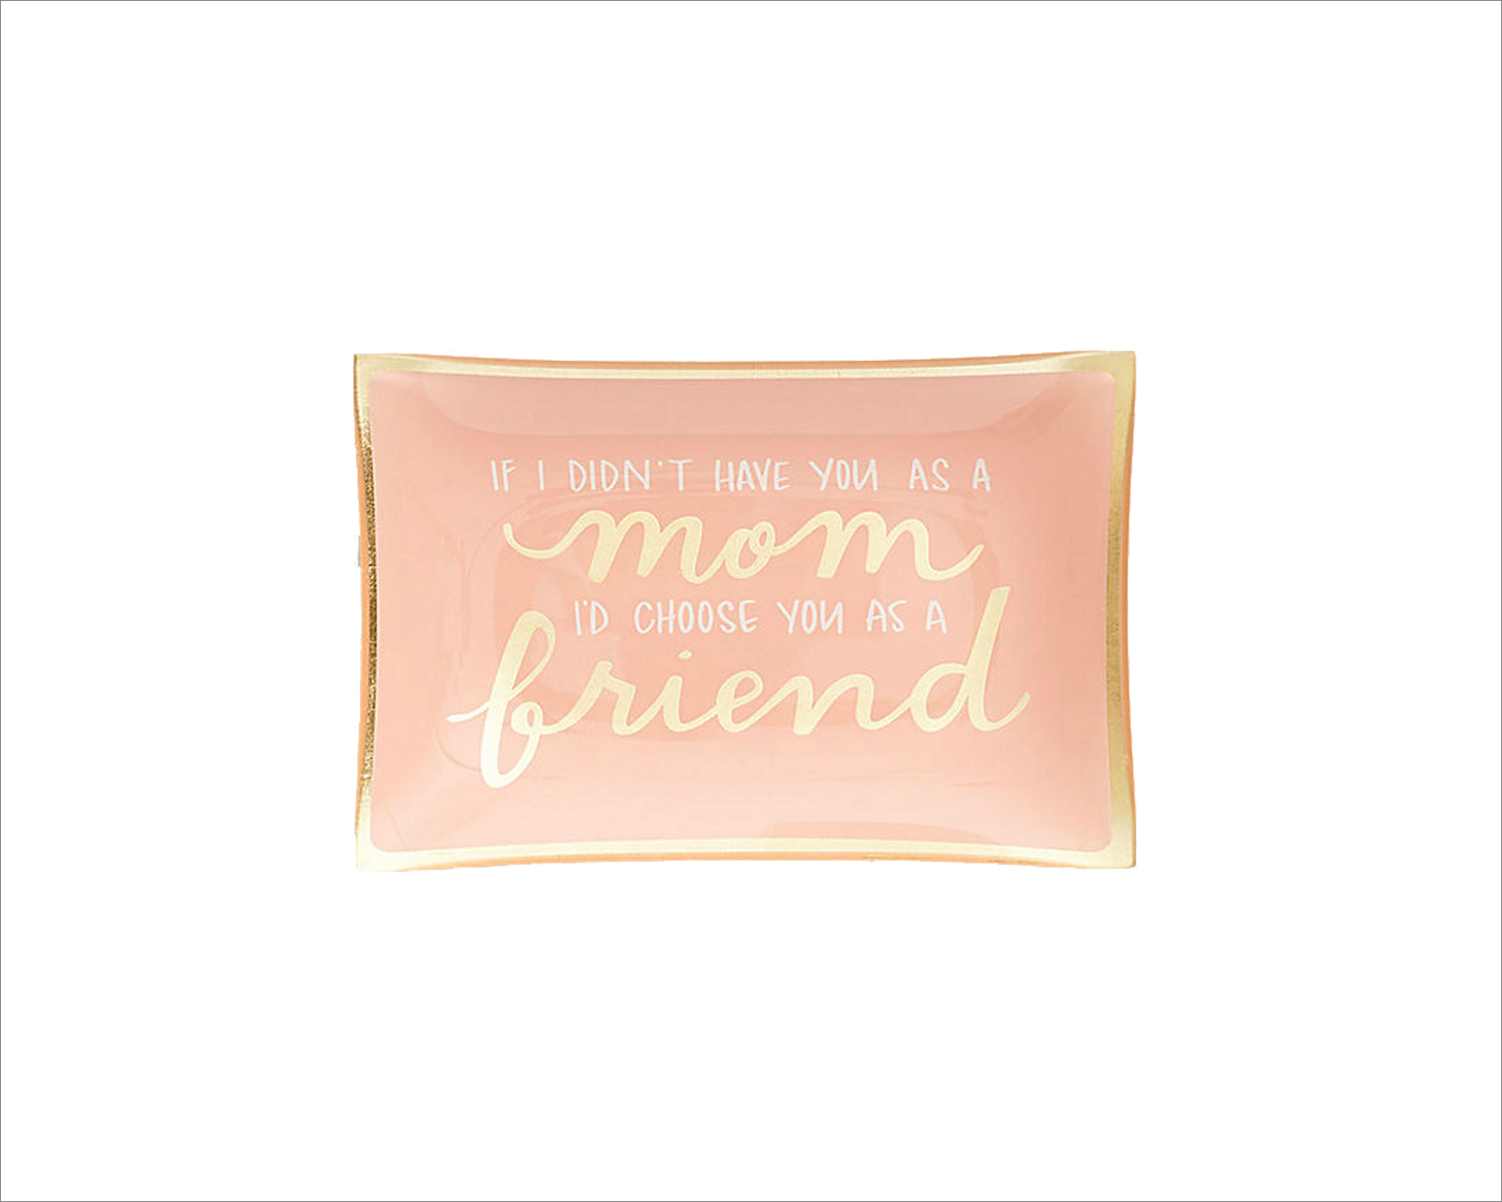 Mom Friend trinket dish gold metallic lettering pink dish Paper Source